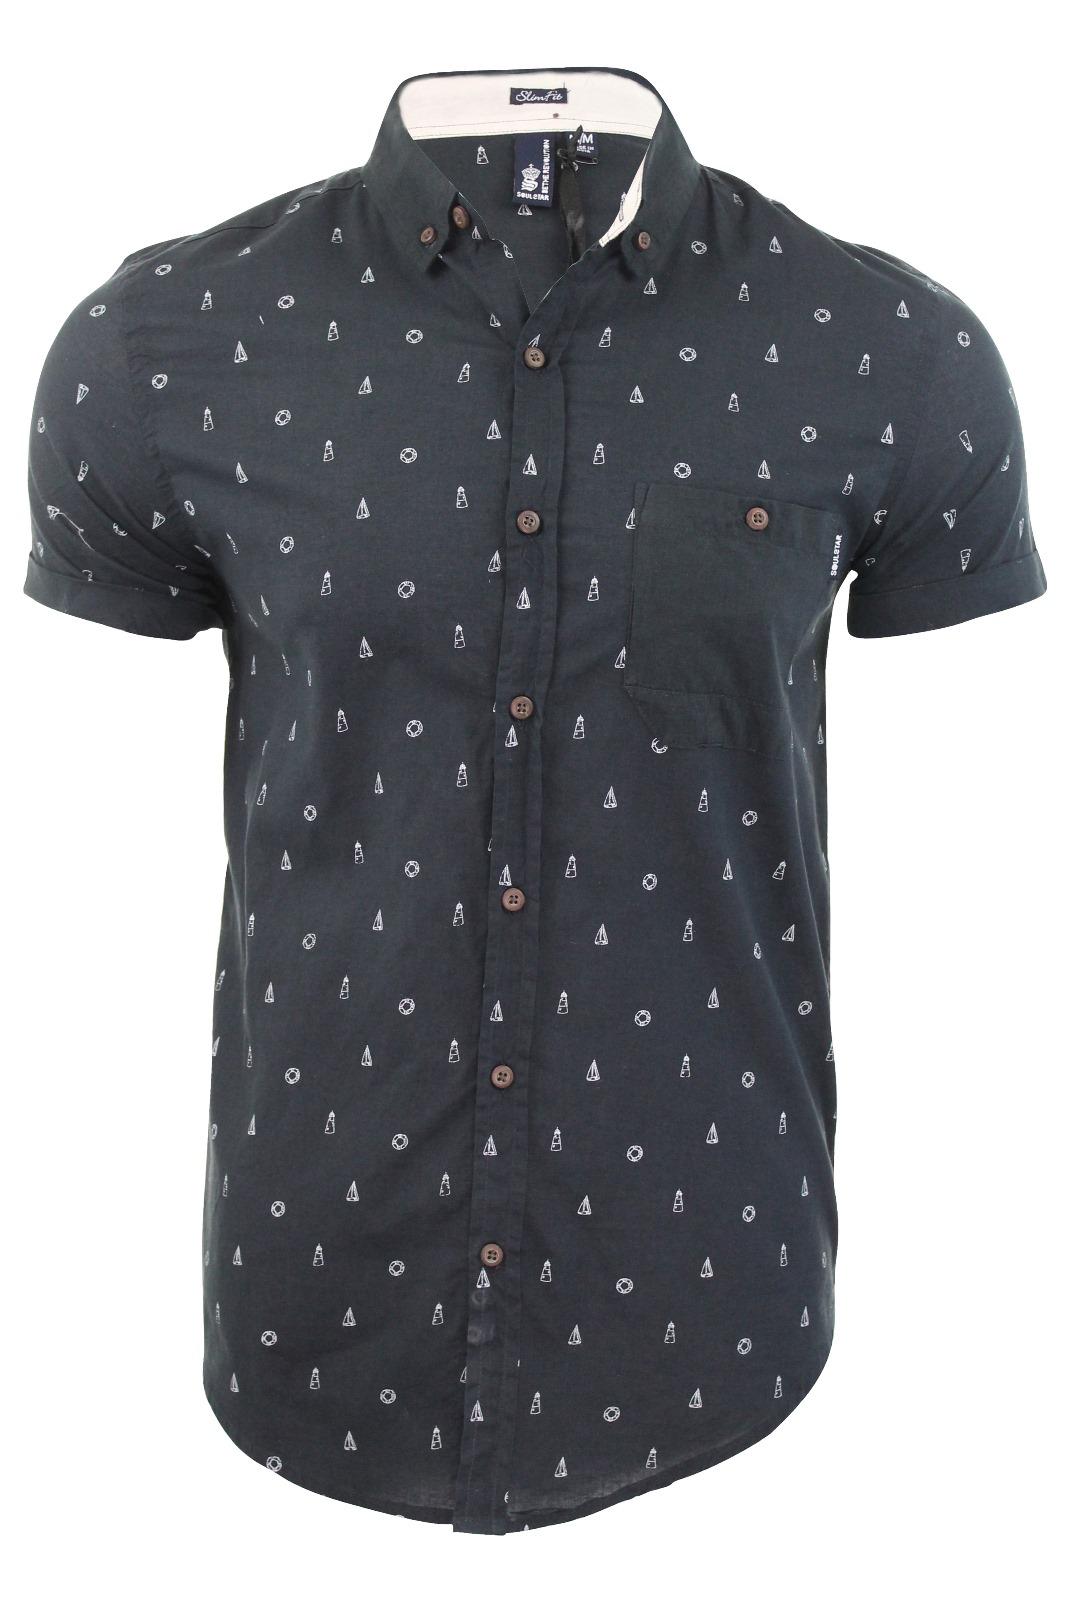 Mens shirt by soul star short sleeved 39 molvin 39 sailor for Mens shirt with stars